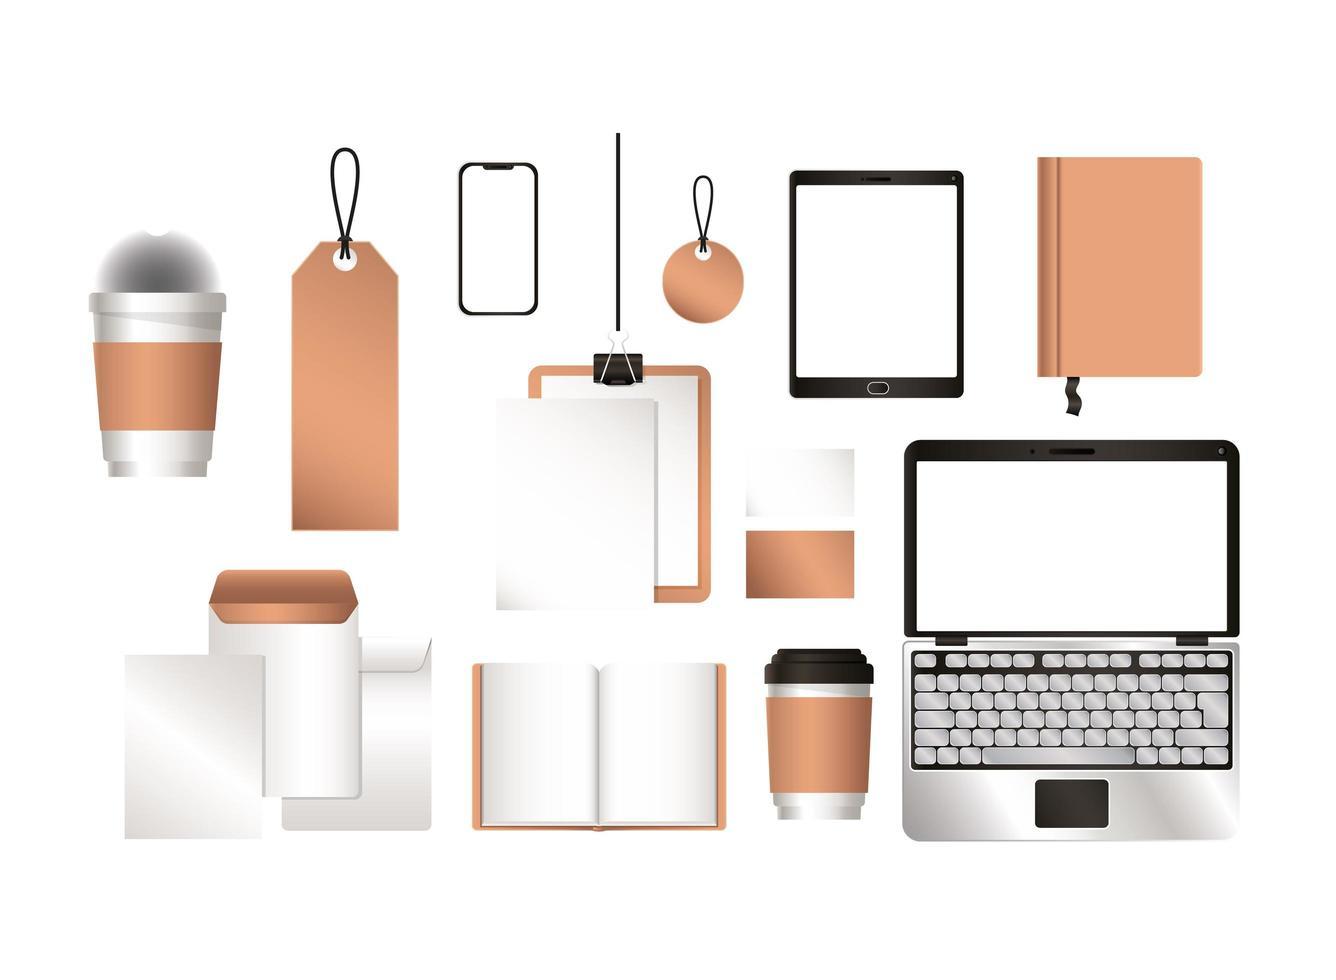 Modell Laptop Tablet Smartphone und Corporate Identity vektor